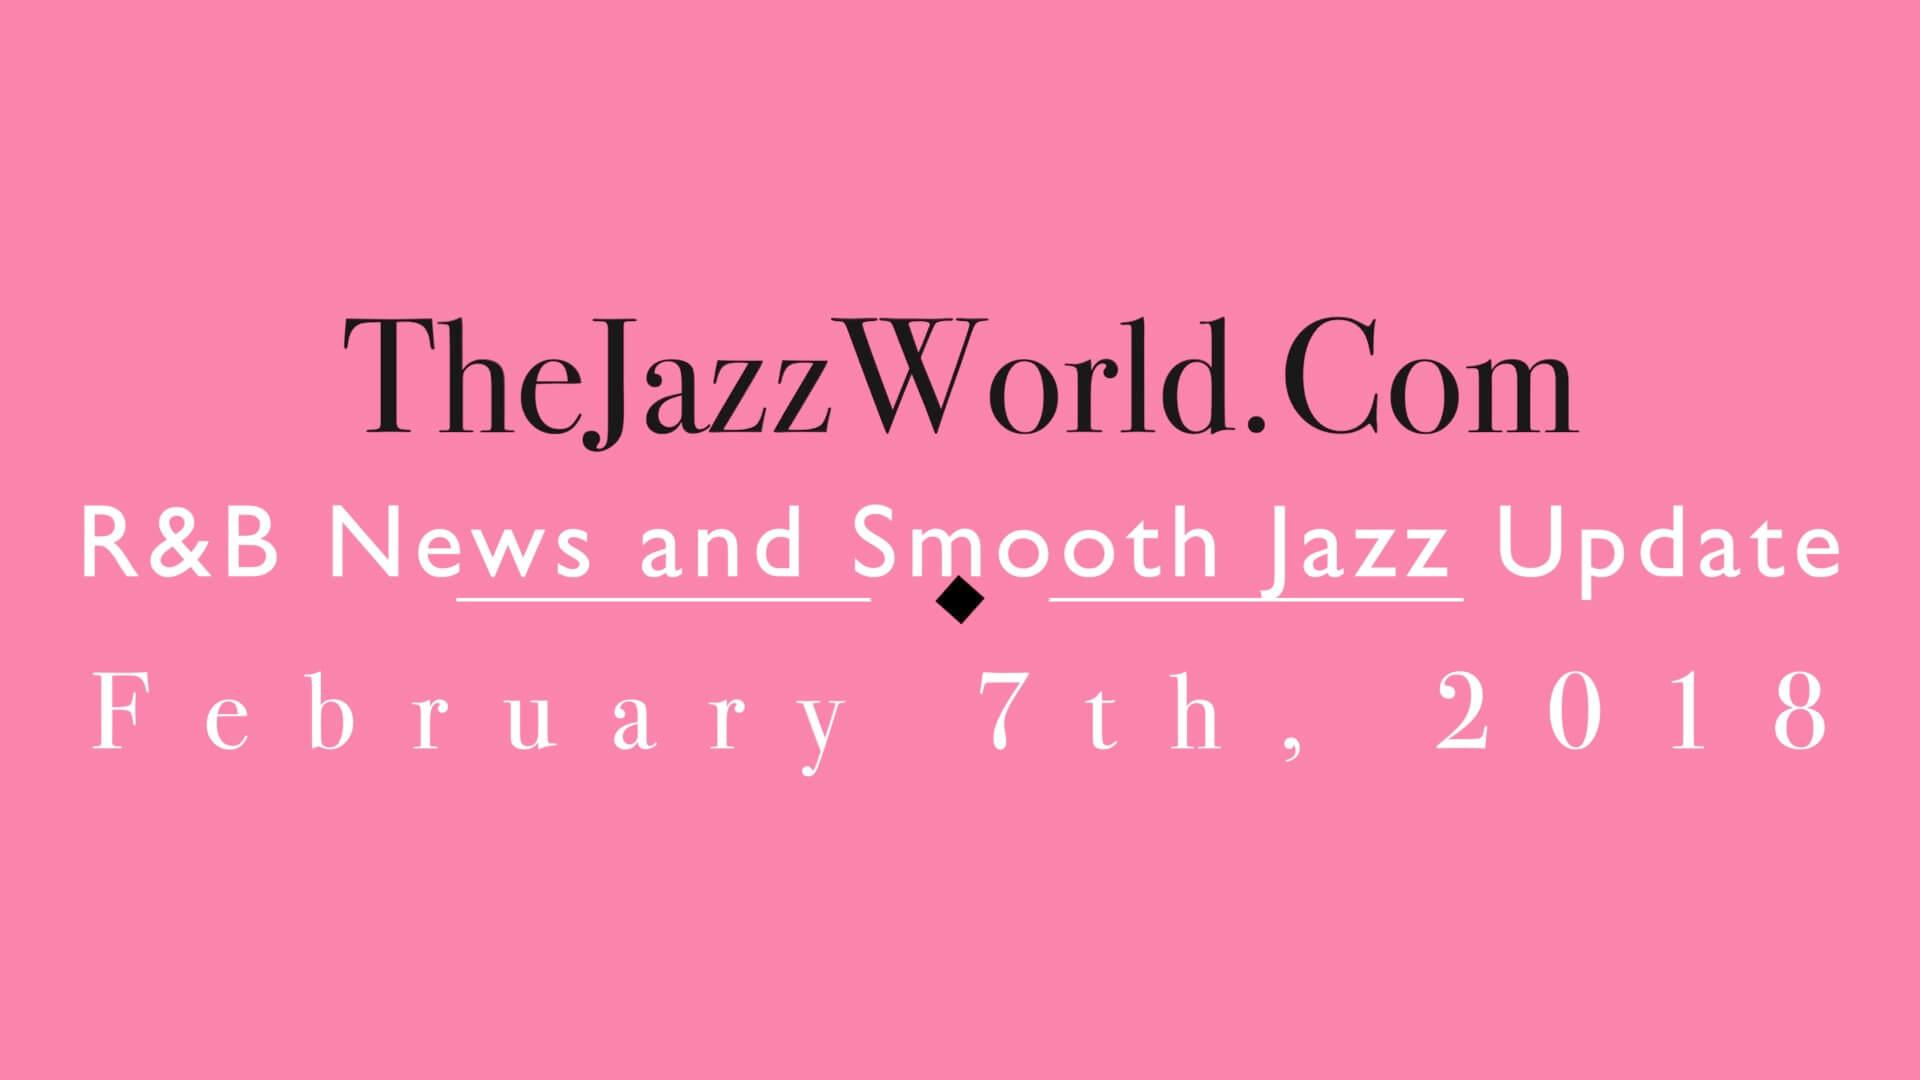 The Jazz World Show 2:7:18